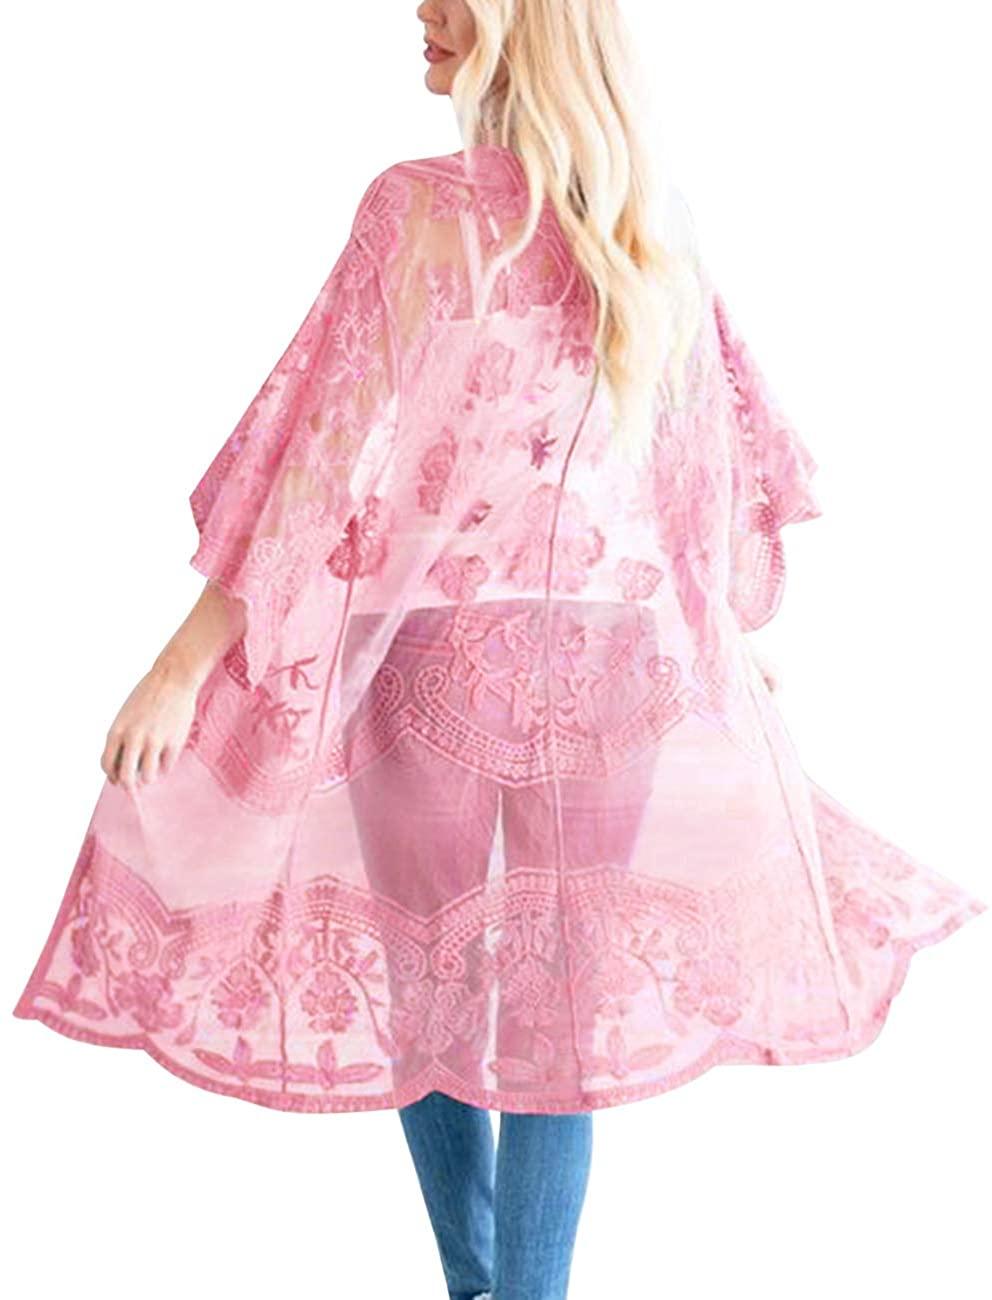 Romanstii Women's Lace Cardigan Floral Crochet Sheer Beach Cover Ups Long Kimono